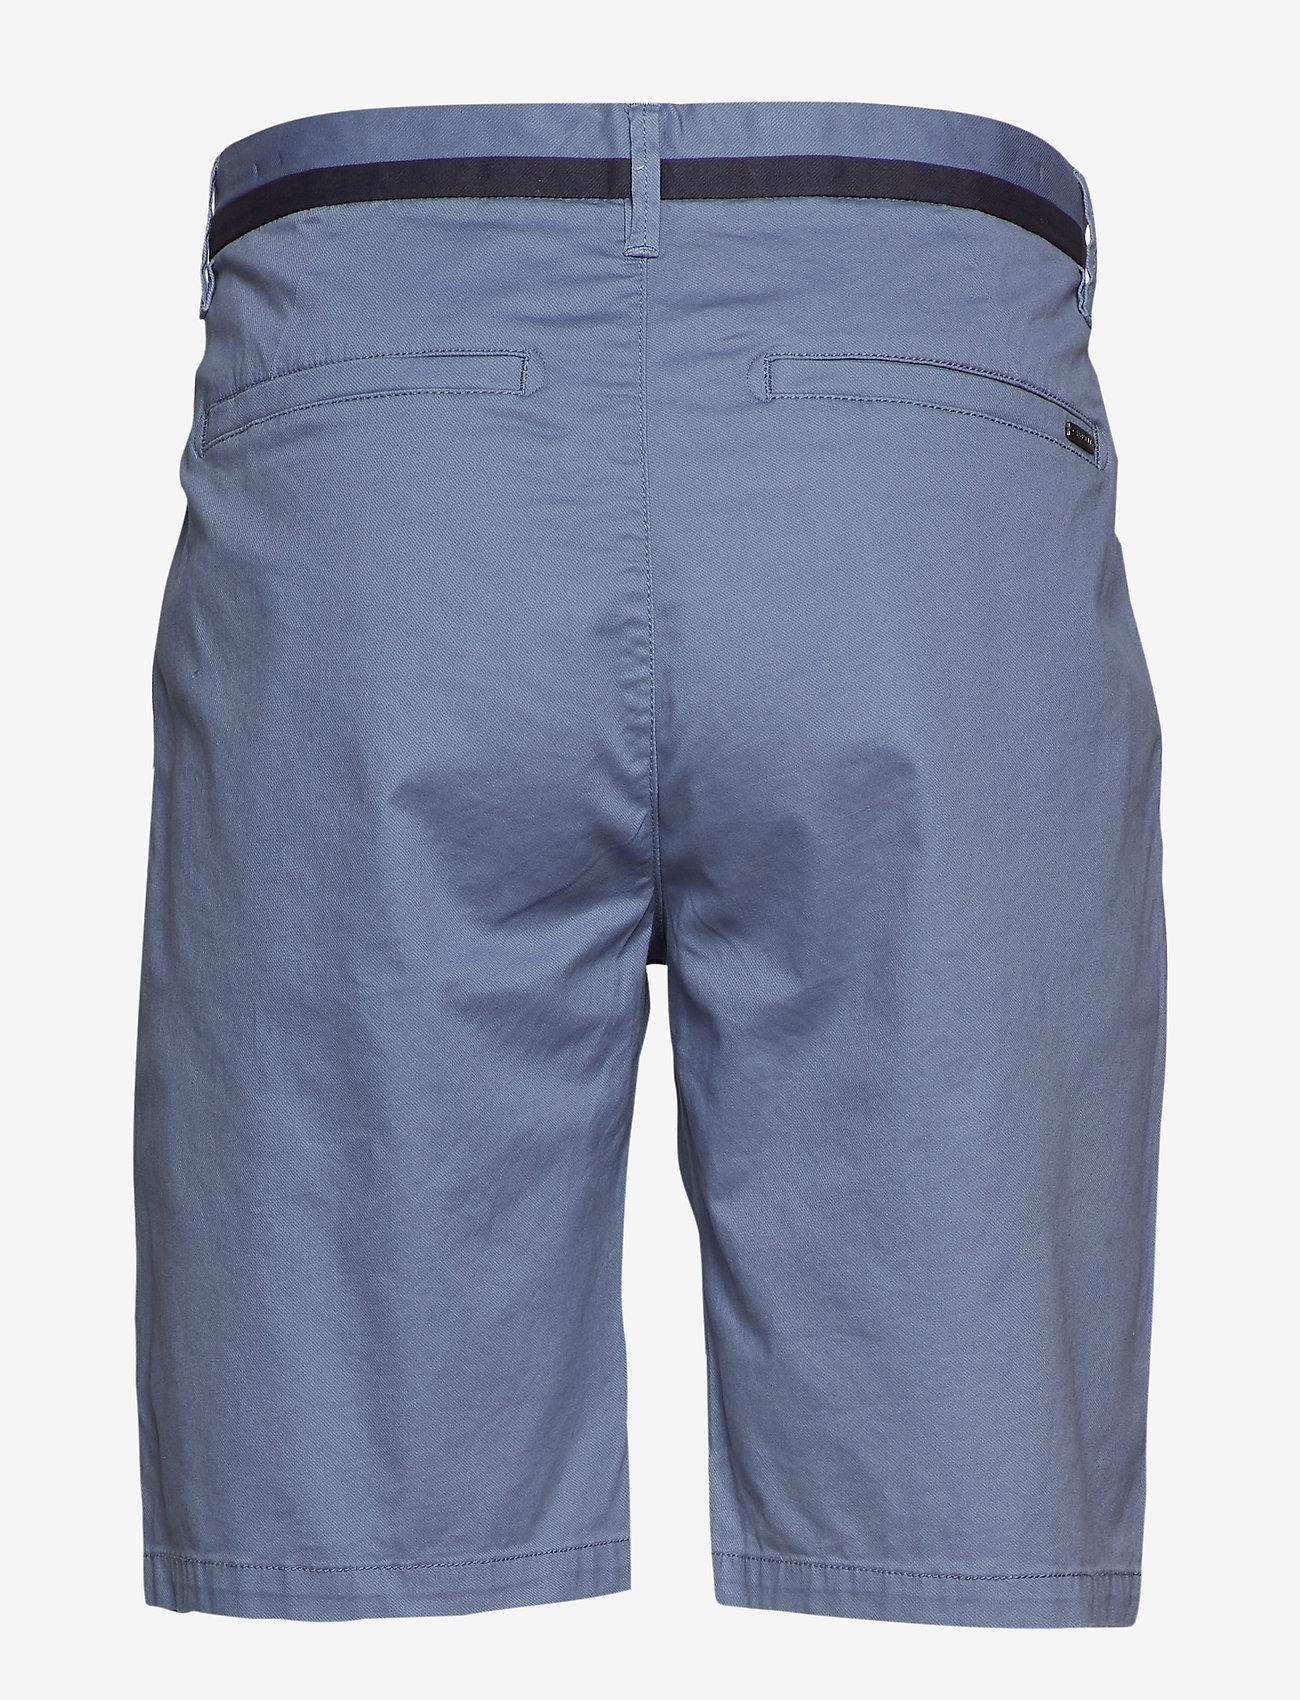 Shorts Woven (Blue Lavender) - Esprit Casual ZmiUpn